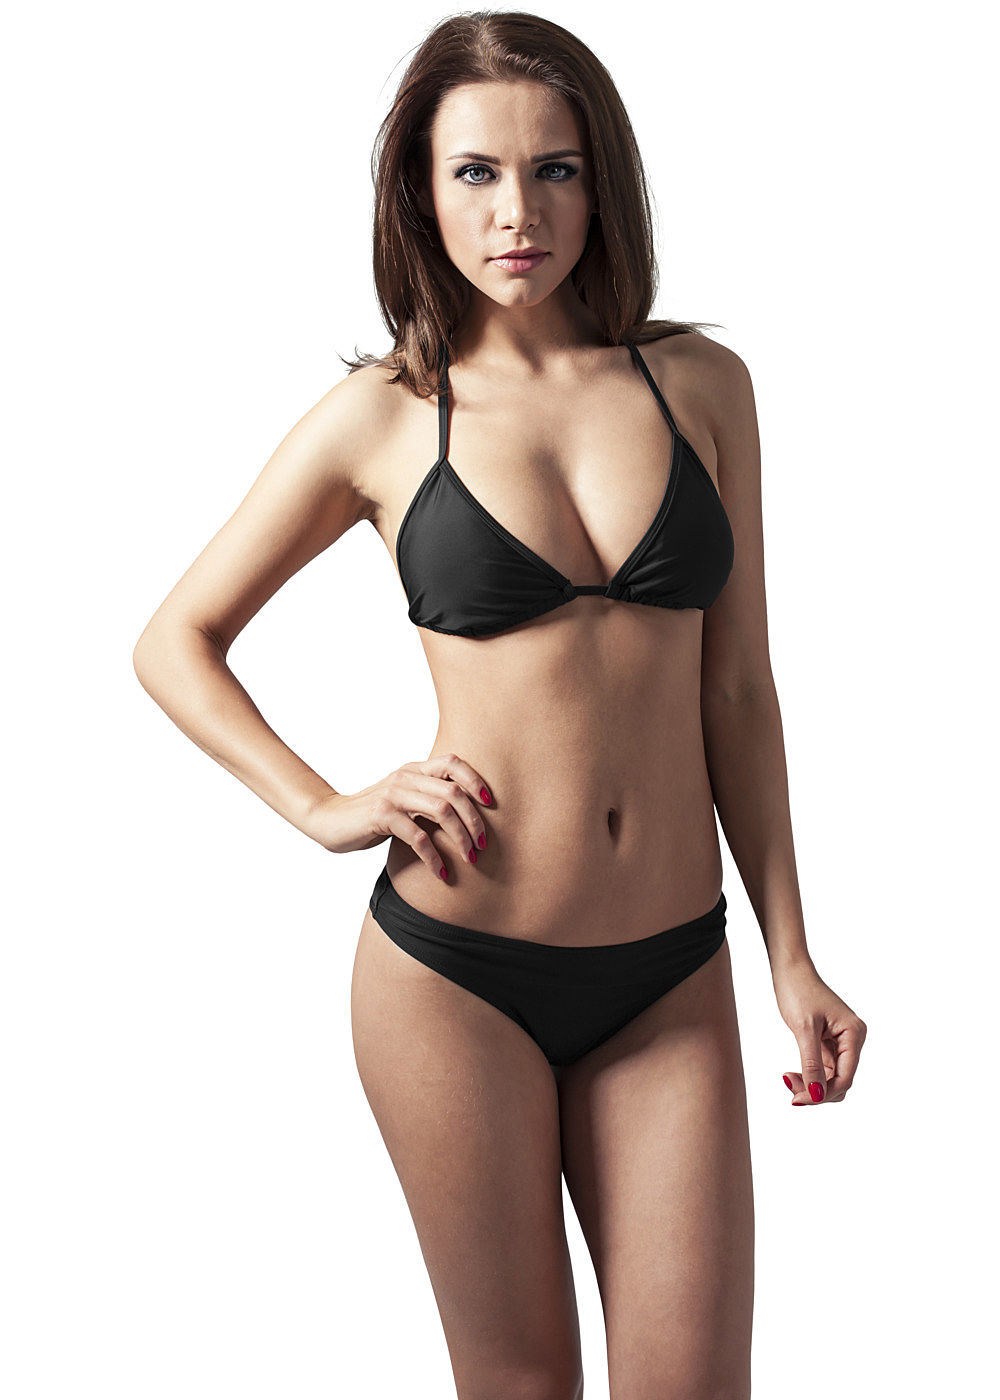 seventyseven lifestyle damen triangel bikini unifarben schwarz 77onlineshop. Black Bedroom Furniture Sets. Home Design Ideas